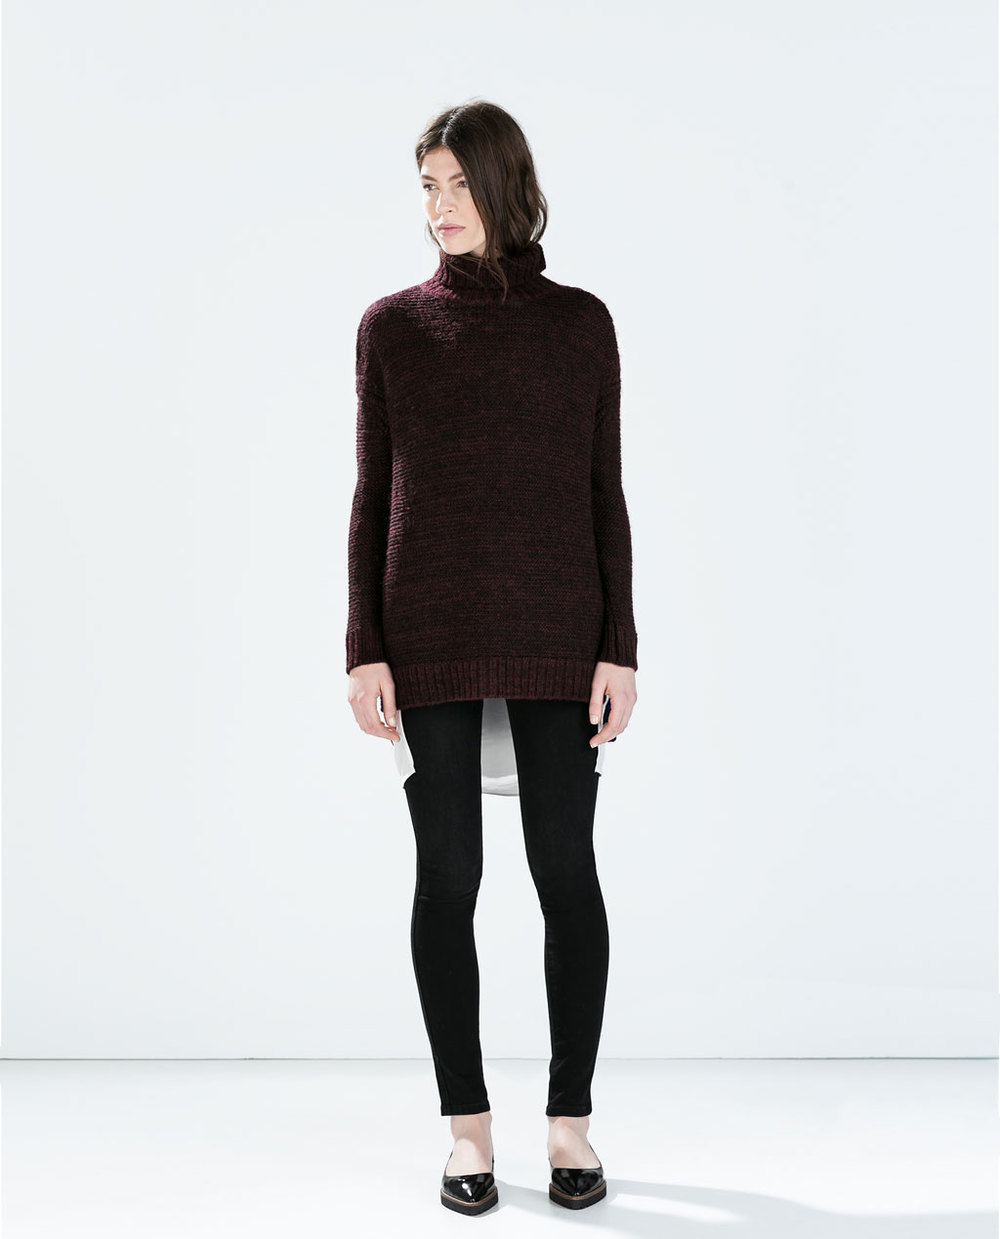 Detailed Knit Top. Available in dark aubergine, navy, black. Zara. $39.90.